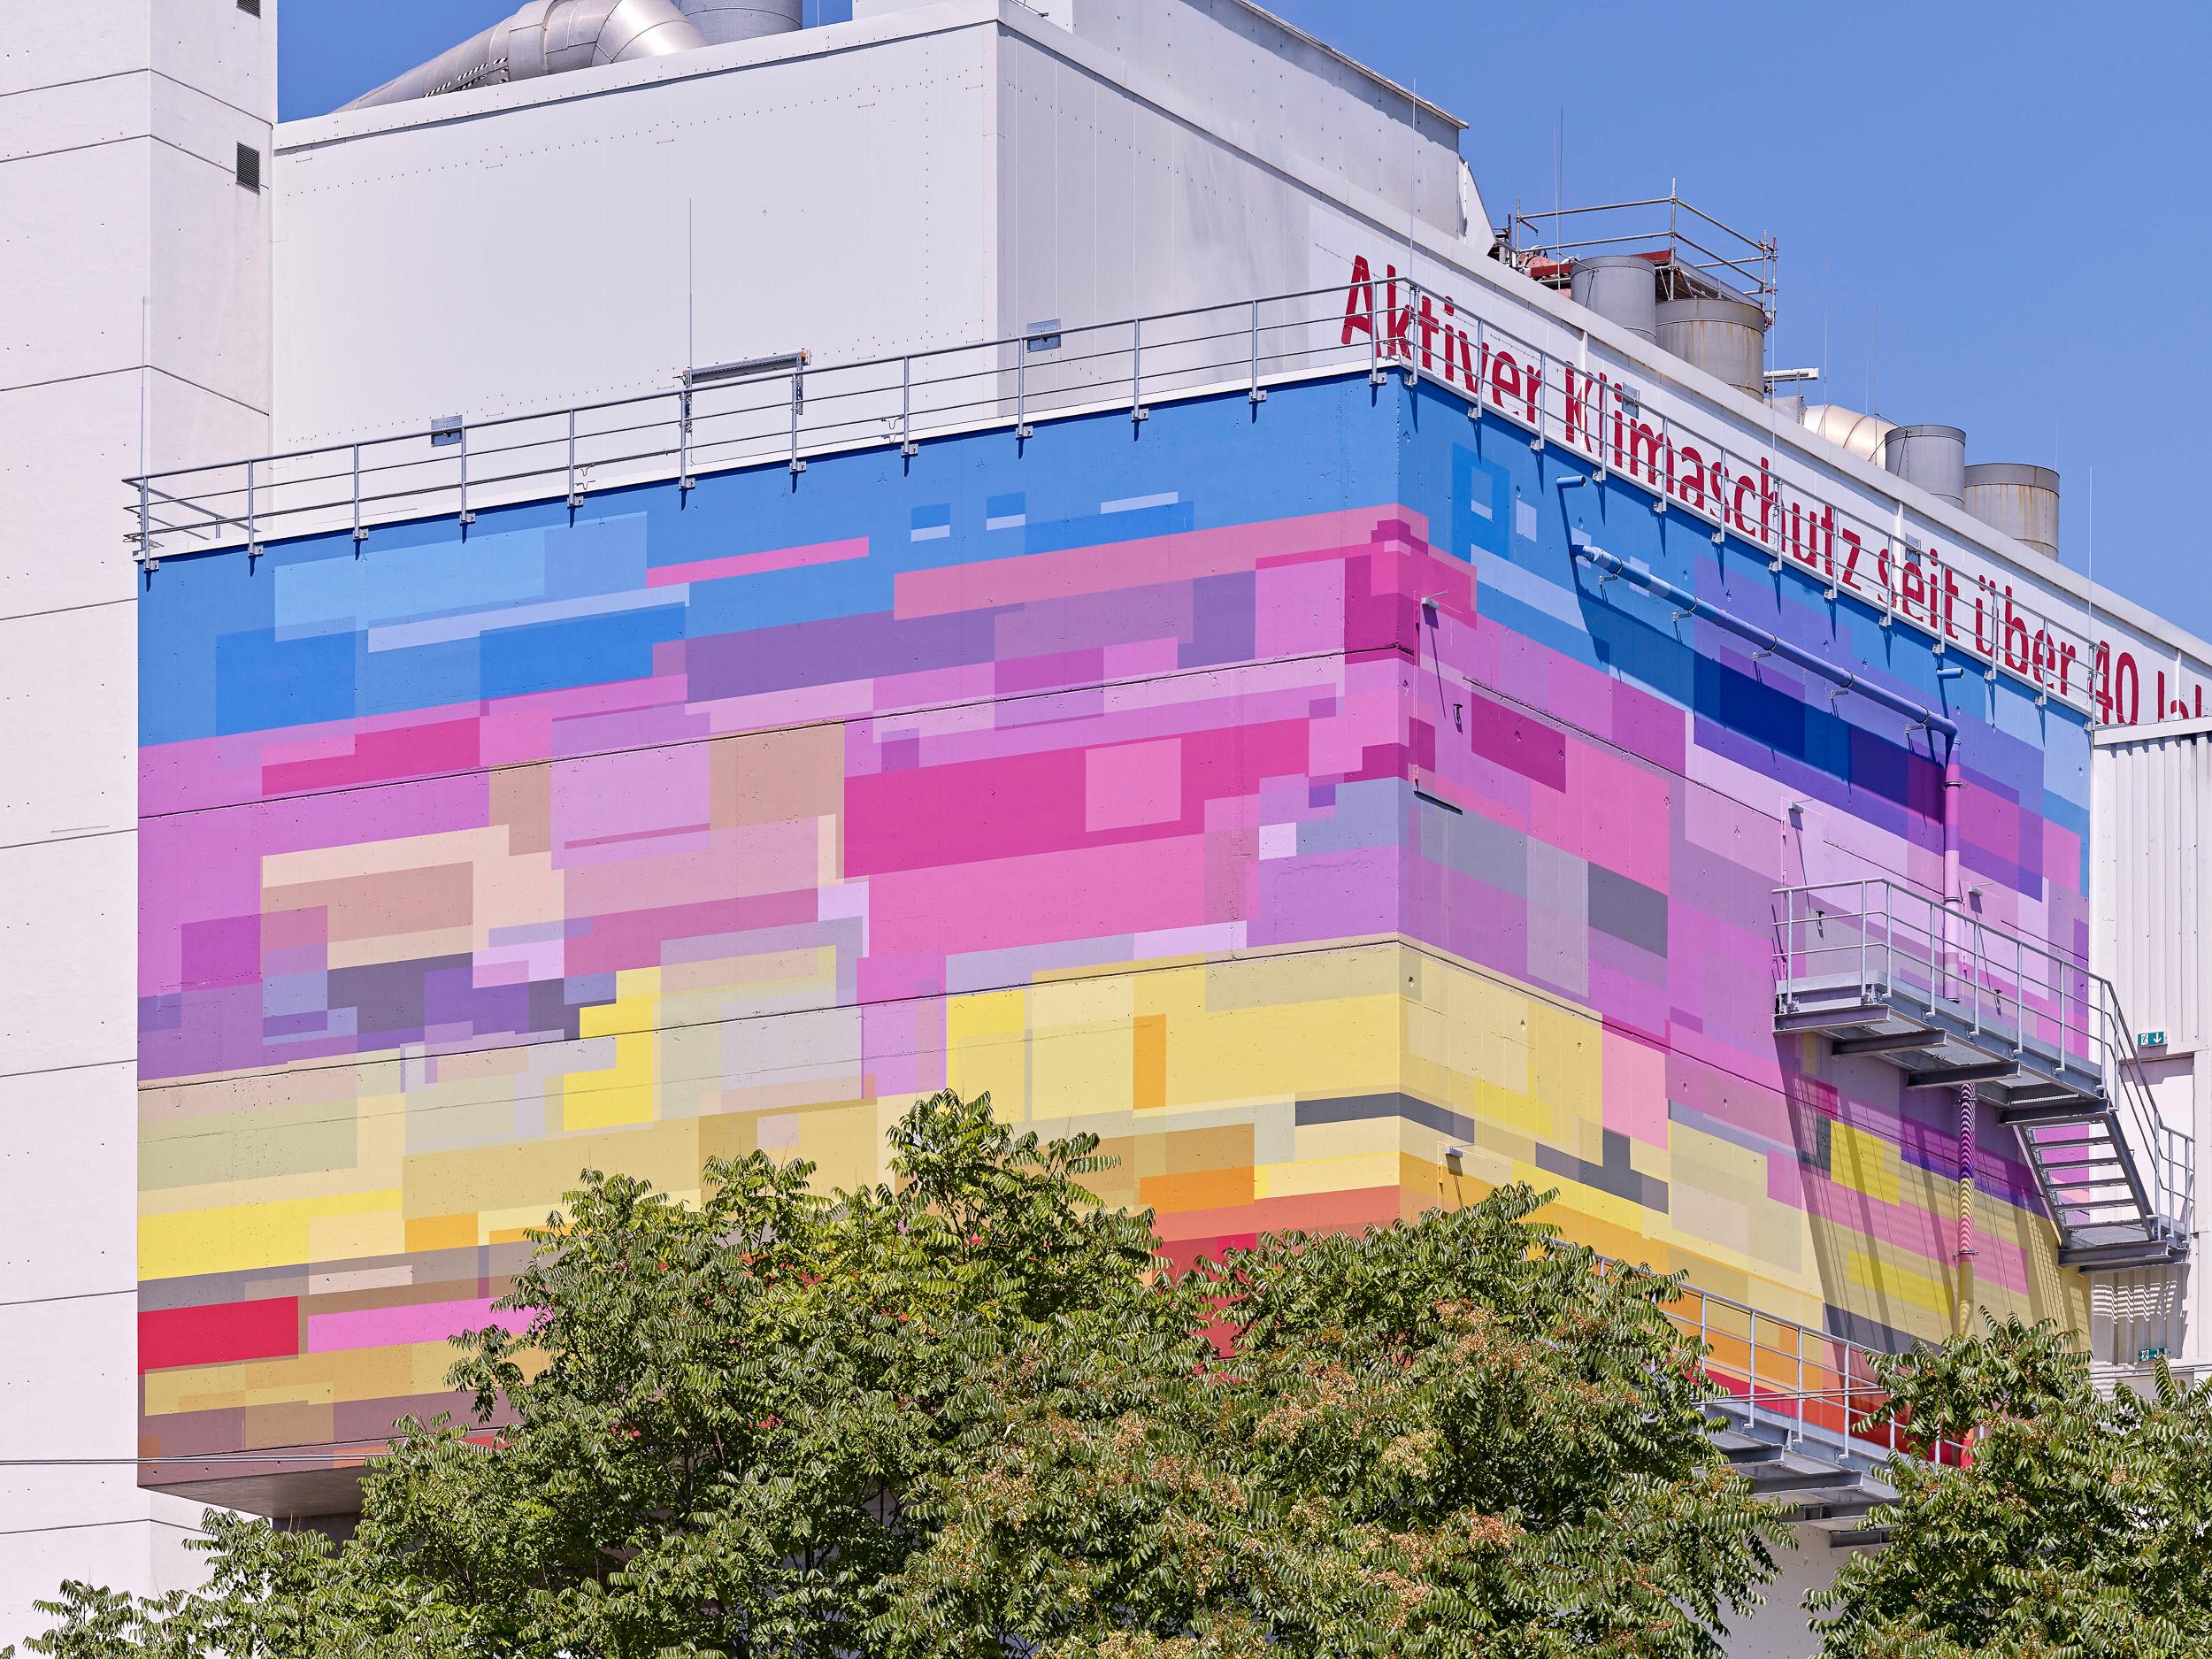 Fassadengestaltung-Industrie-Ludwigshafen-modern-farbig-bunt-kraftwerk-beton.jpg